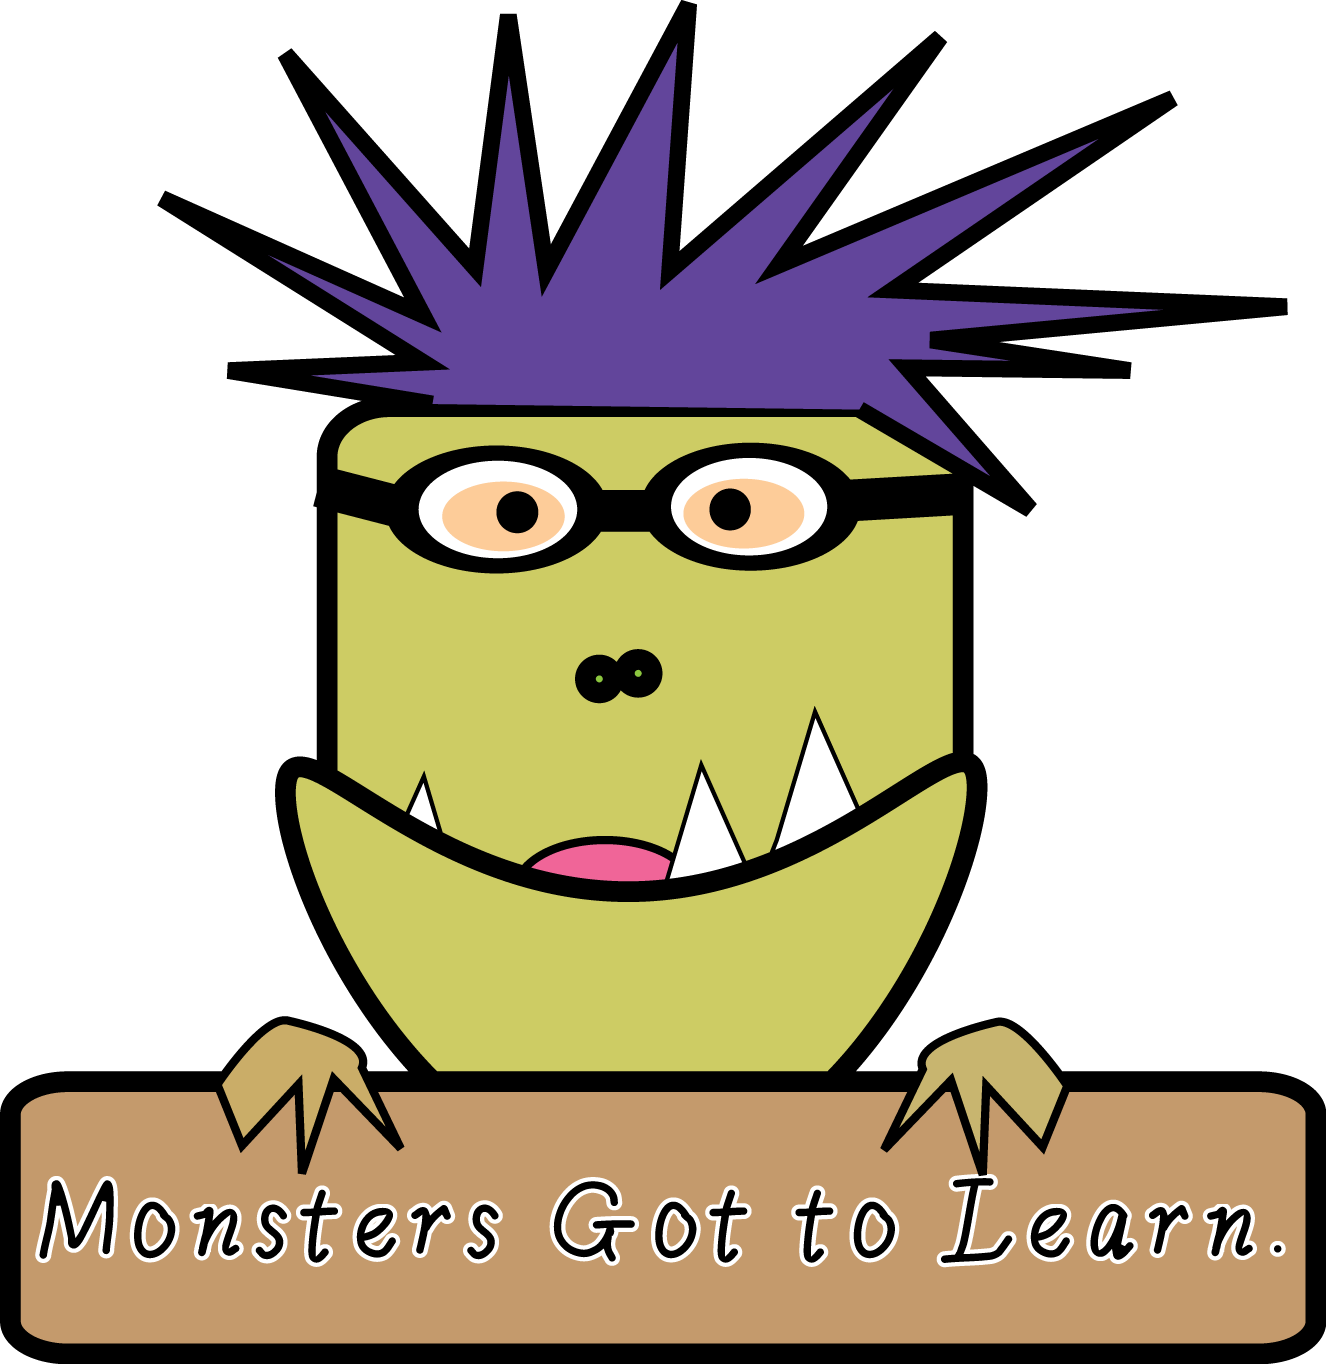 1326x1364 Monster Addendum 5 Free Clip Art Creatures. Digital Divide